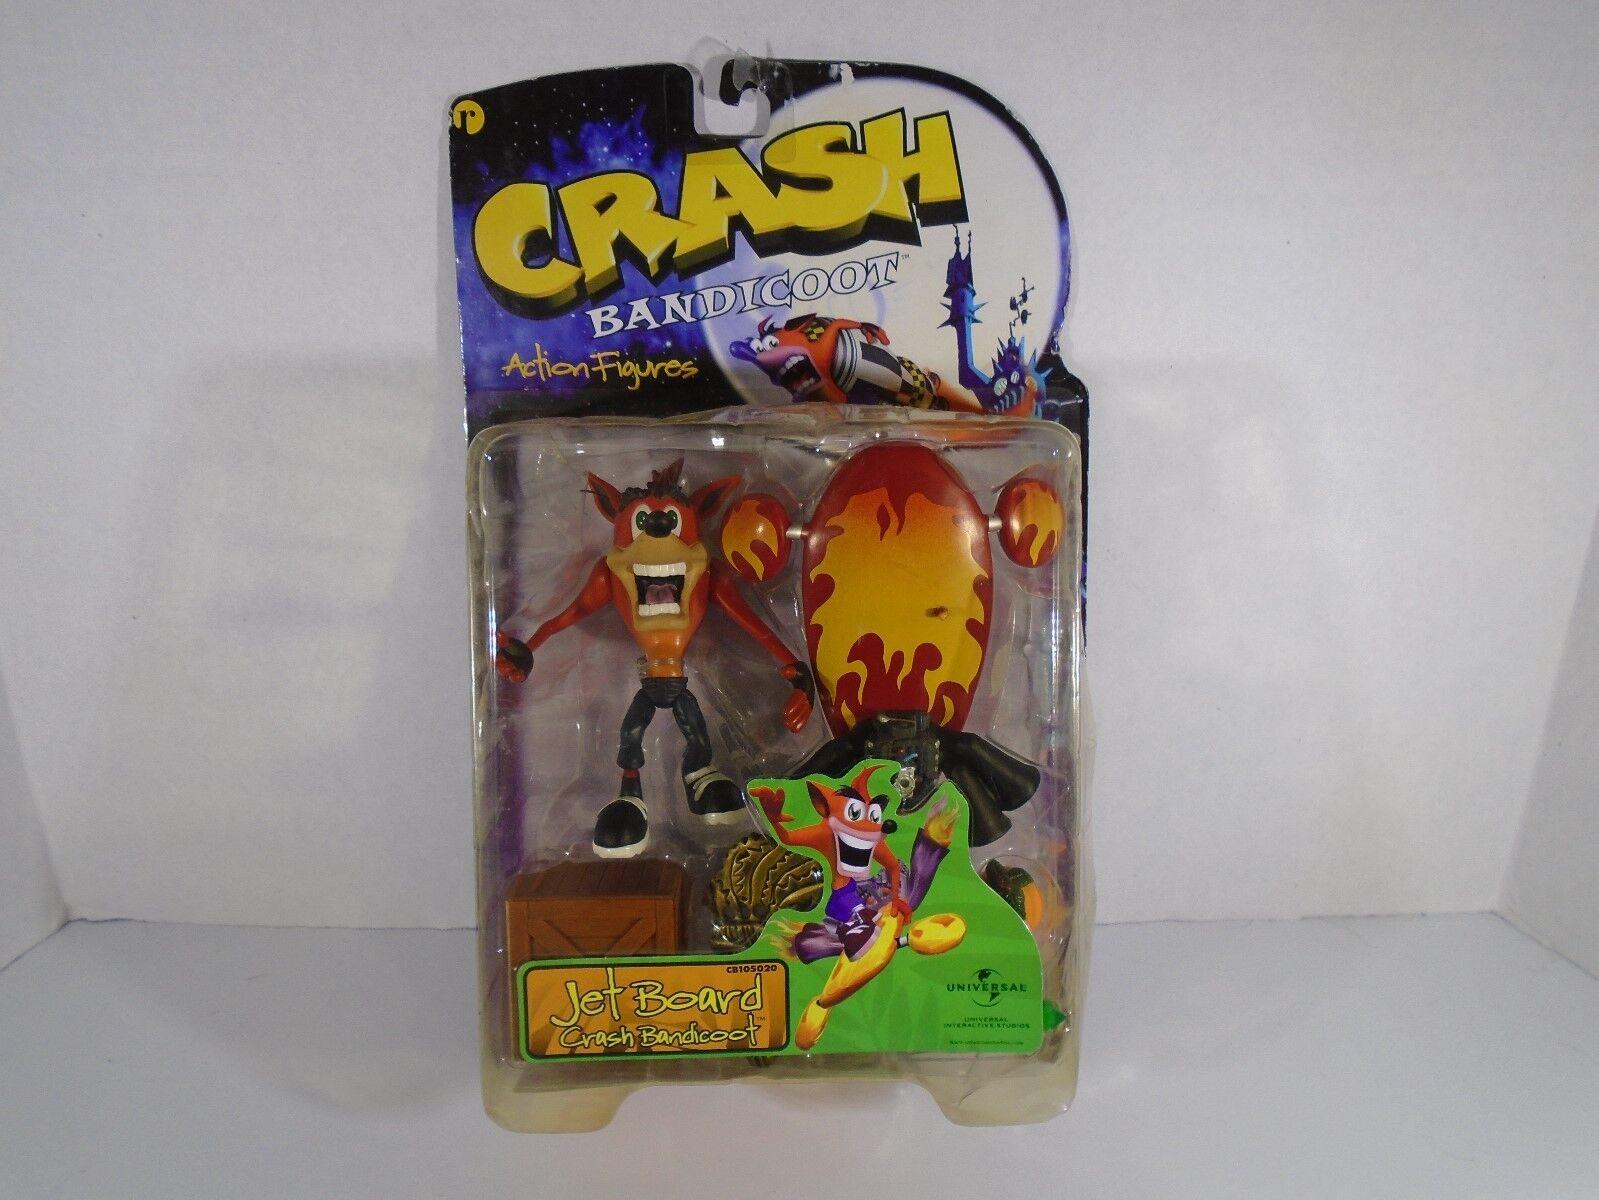 1998 RESAURUS--CRASH BANDICOOT--JET BOARD CRASH BANDICOOT FIGURE (NEW)